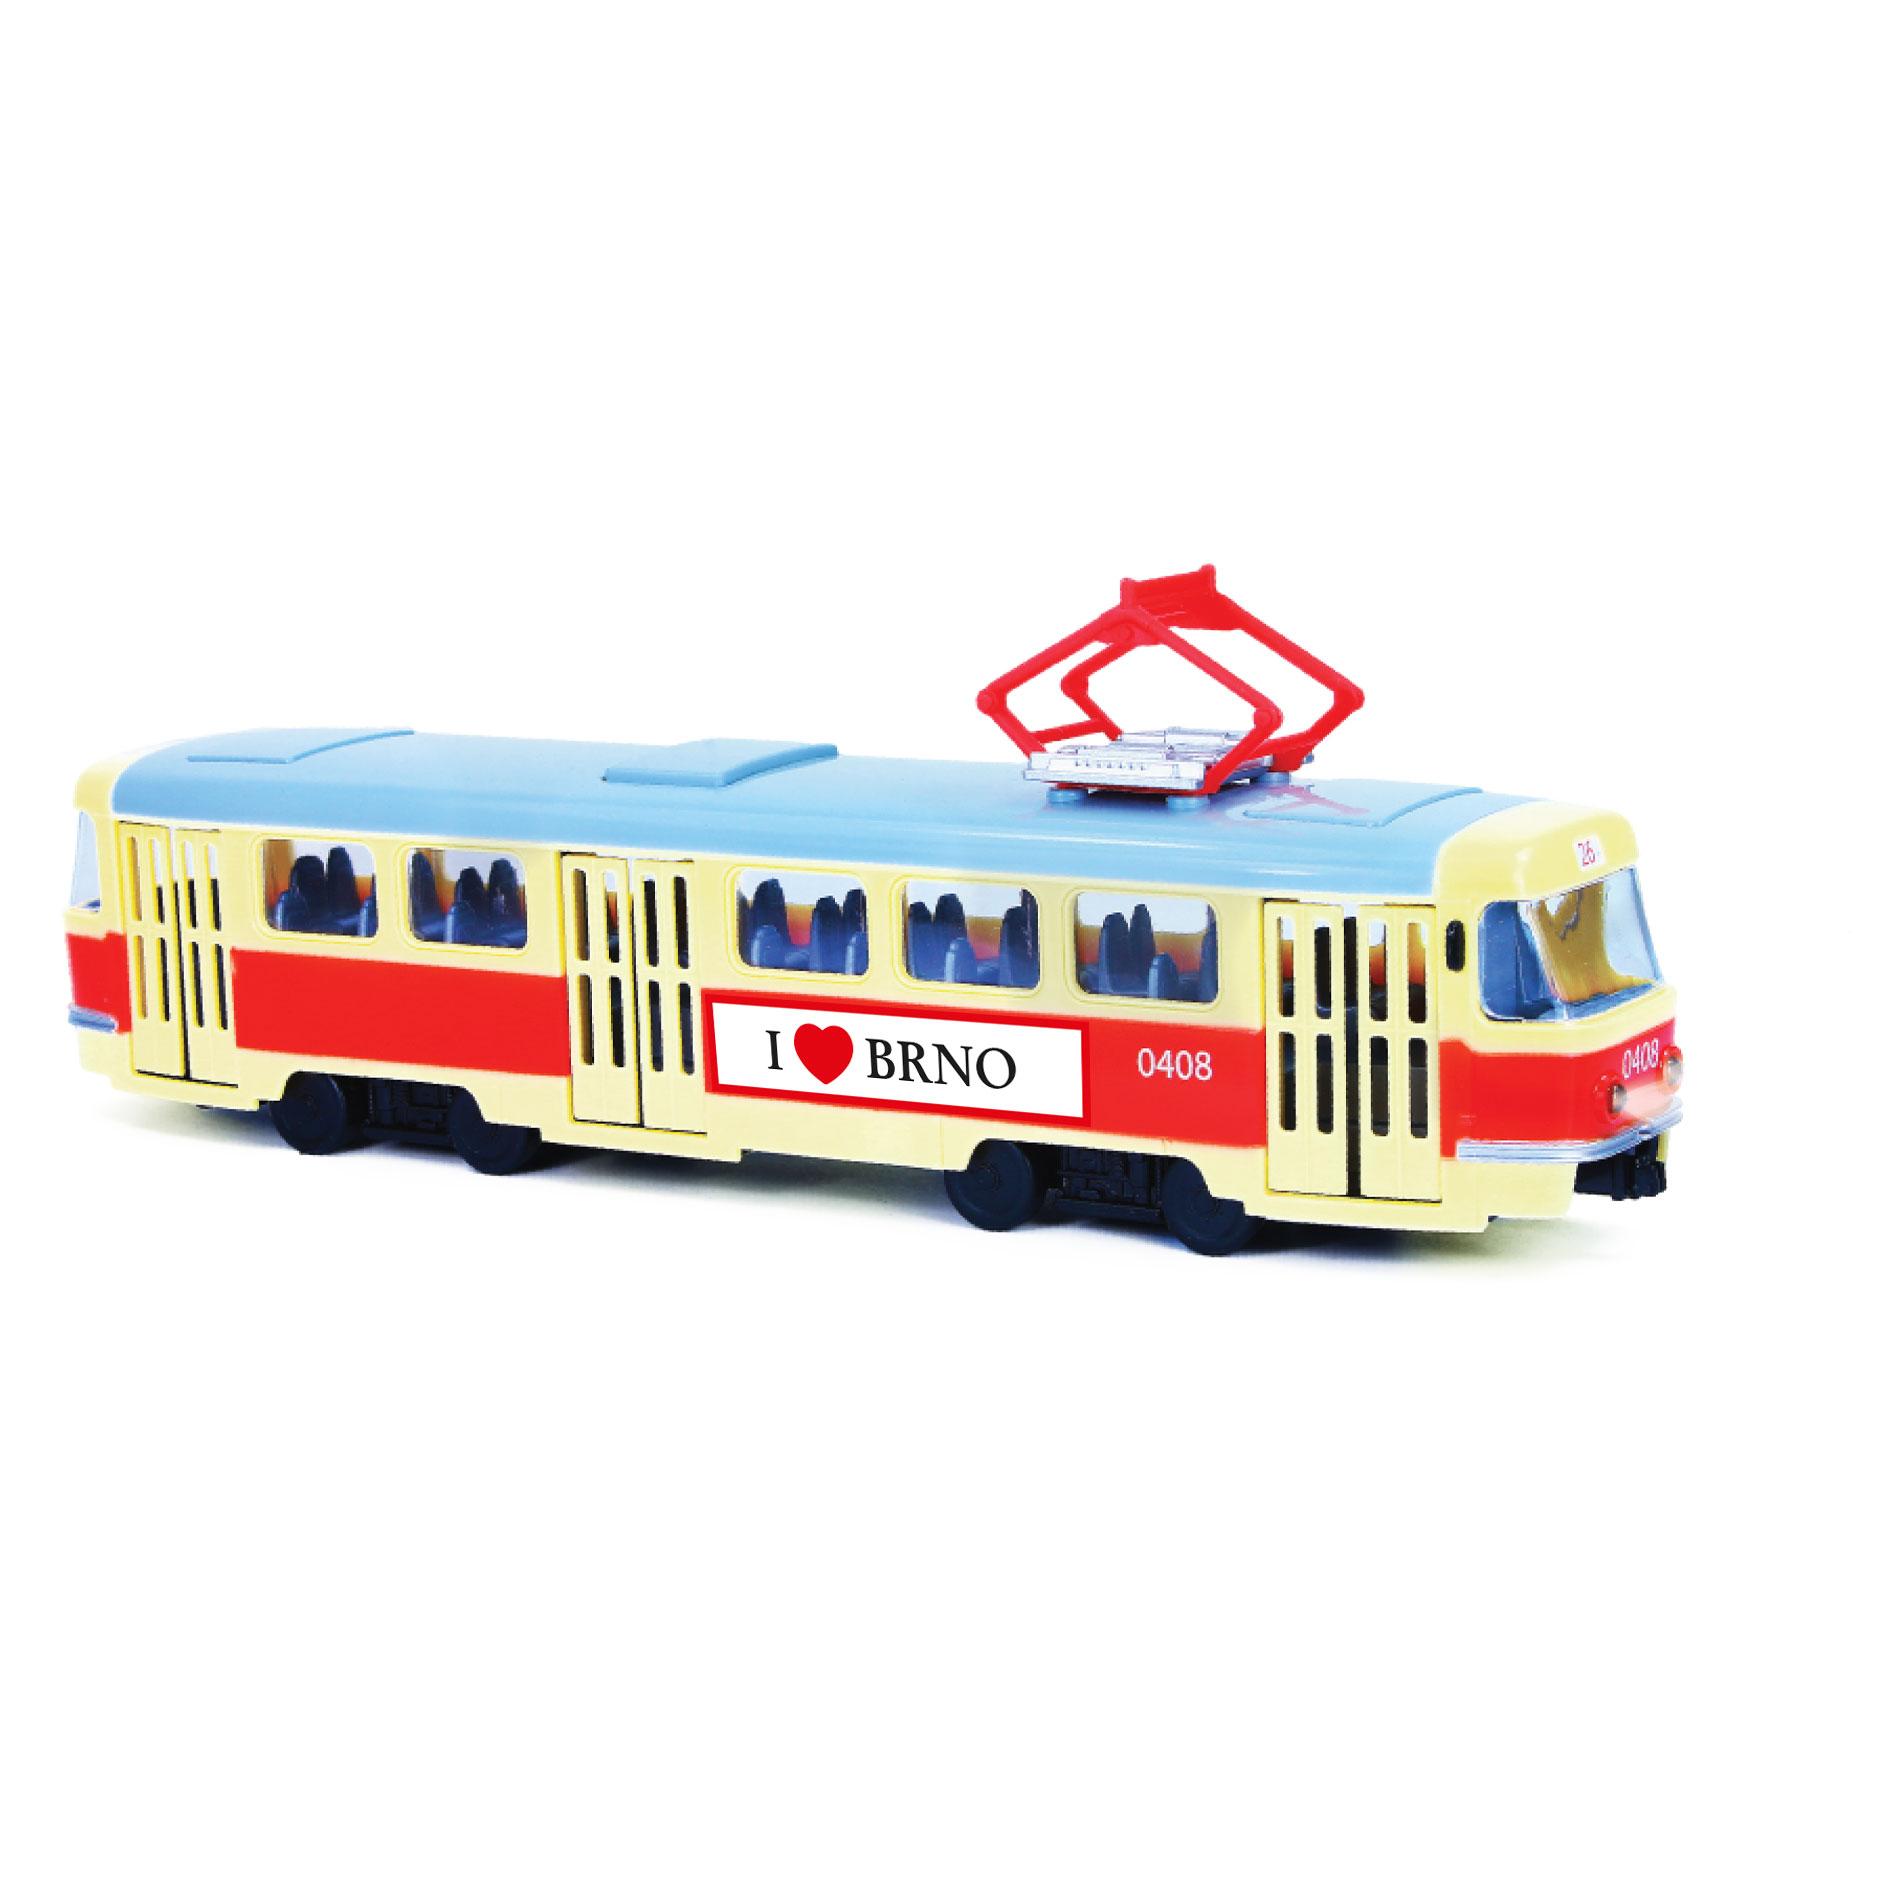 Tramvaj která hlásí zastávky česky 28 cm BRNO